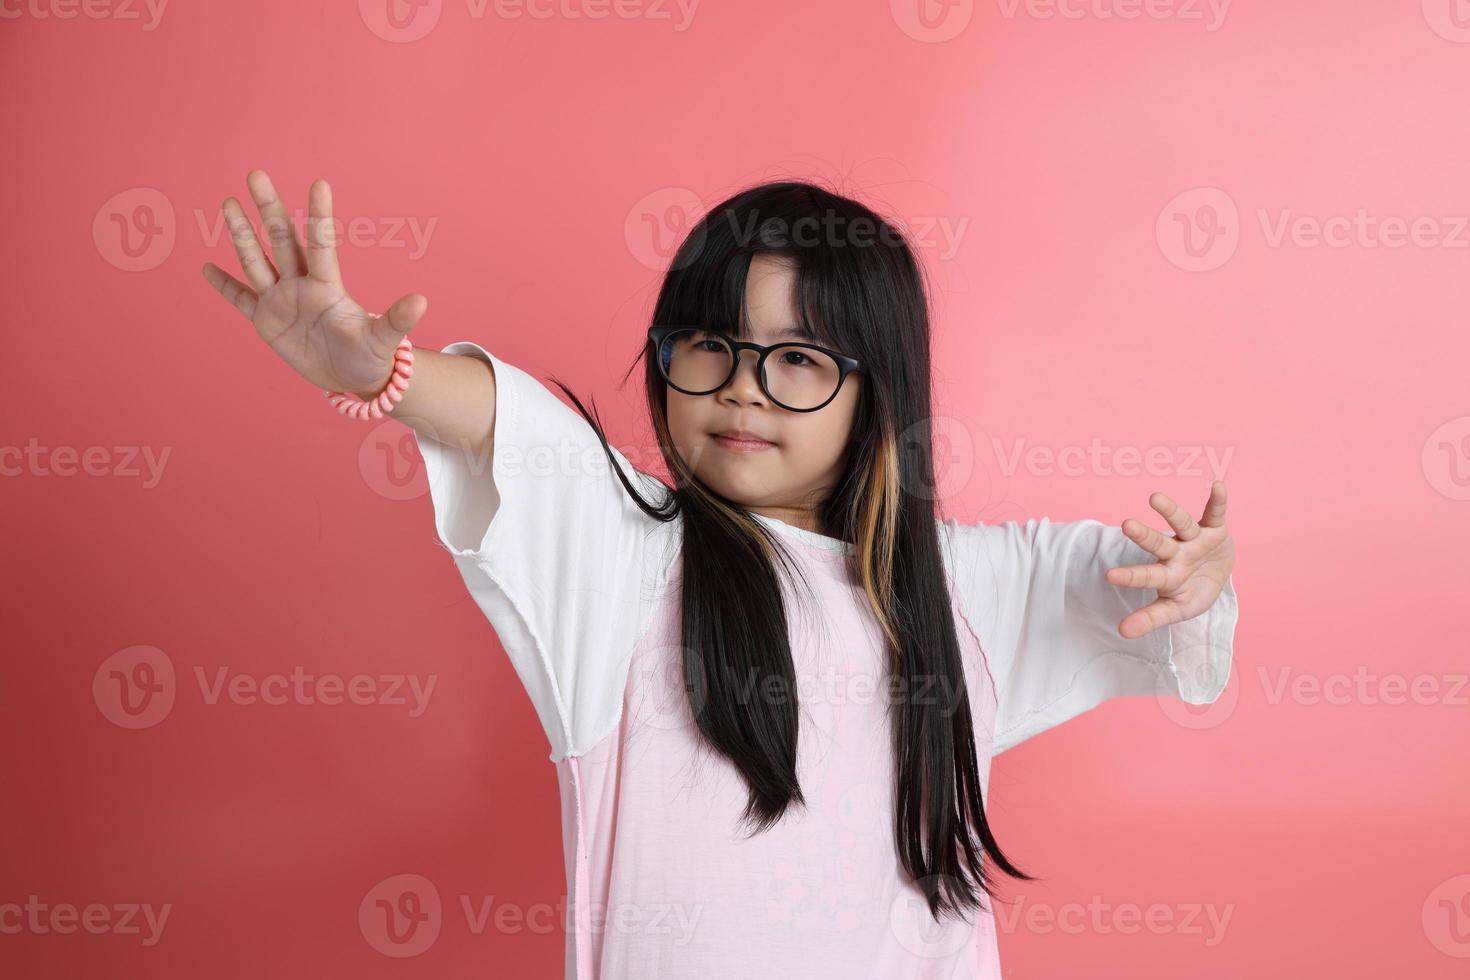 carina ragazza asiatica foto